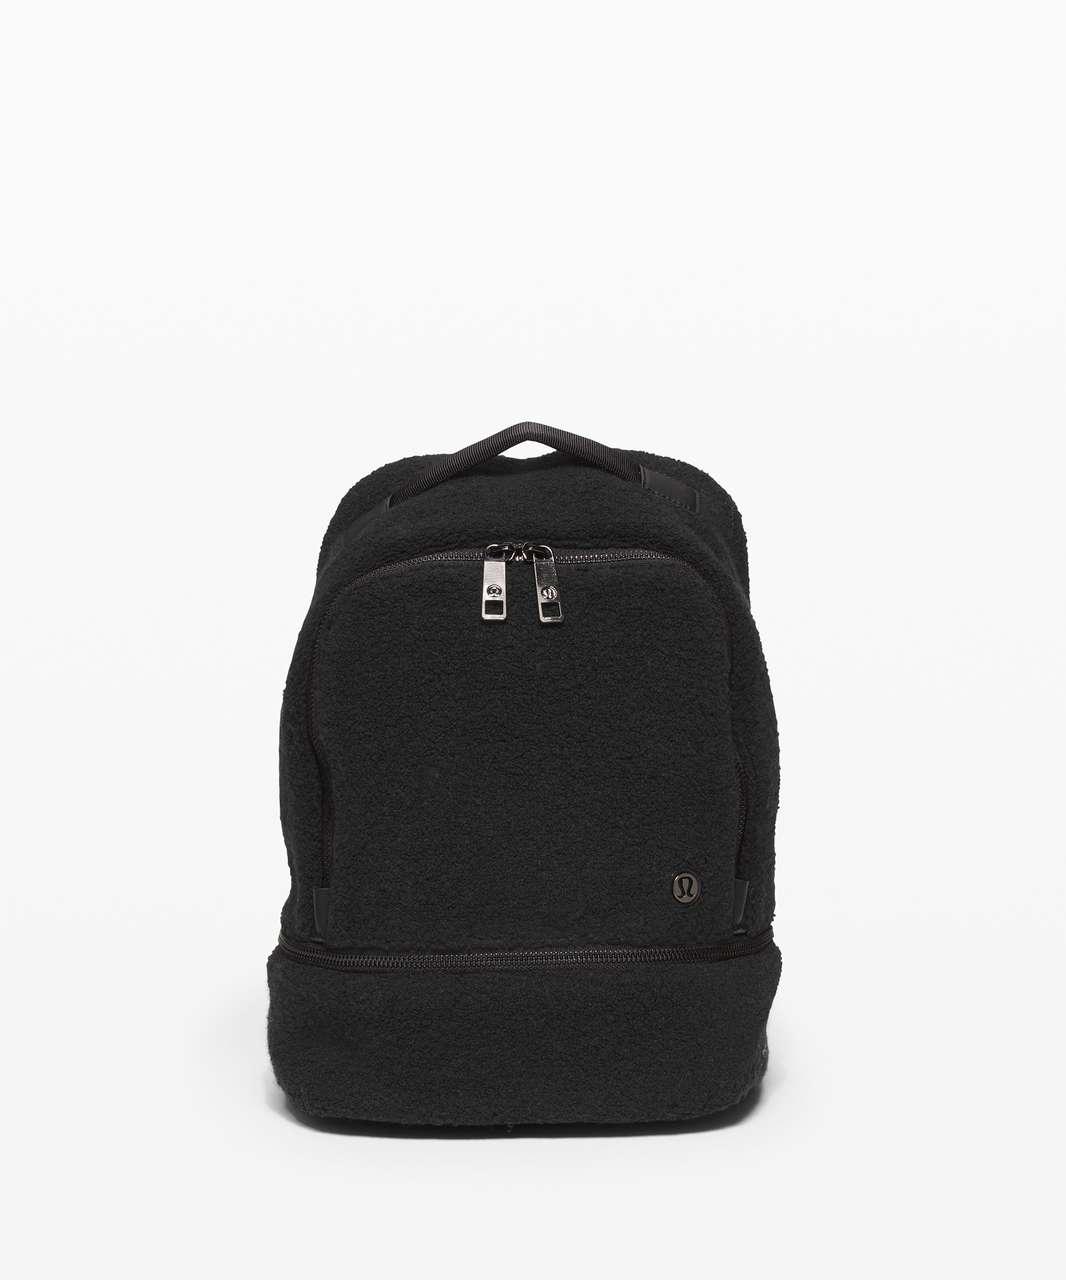 Lululemon City Adventurer Backpack Mini *Sherpa Fleece 10L - Black